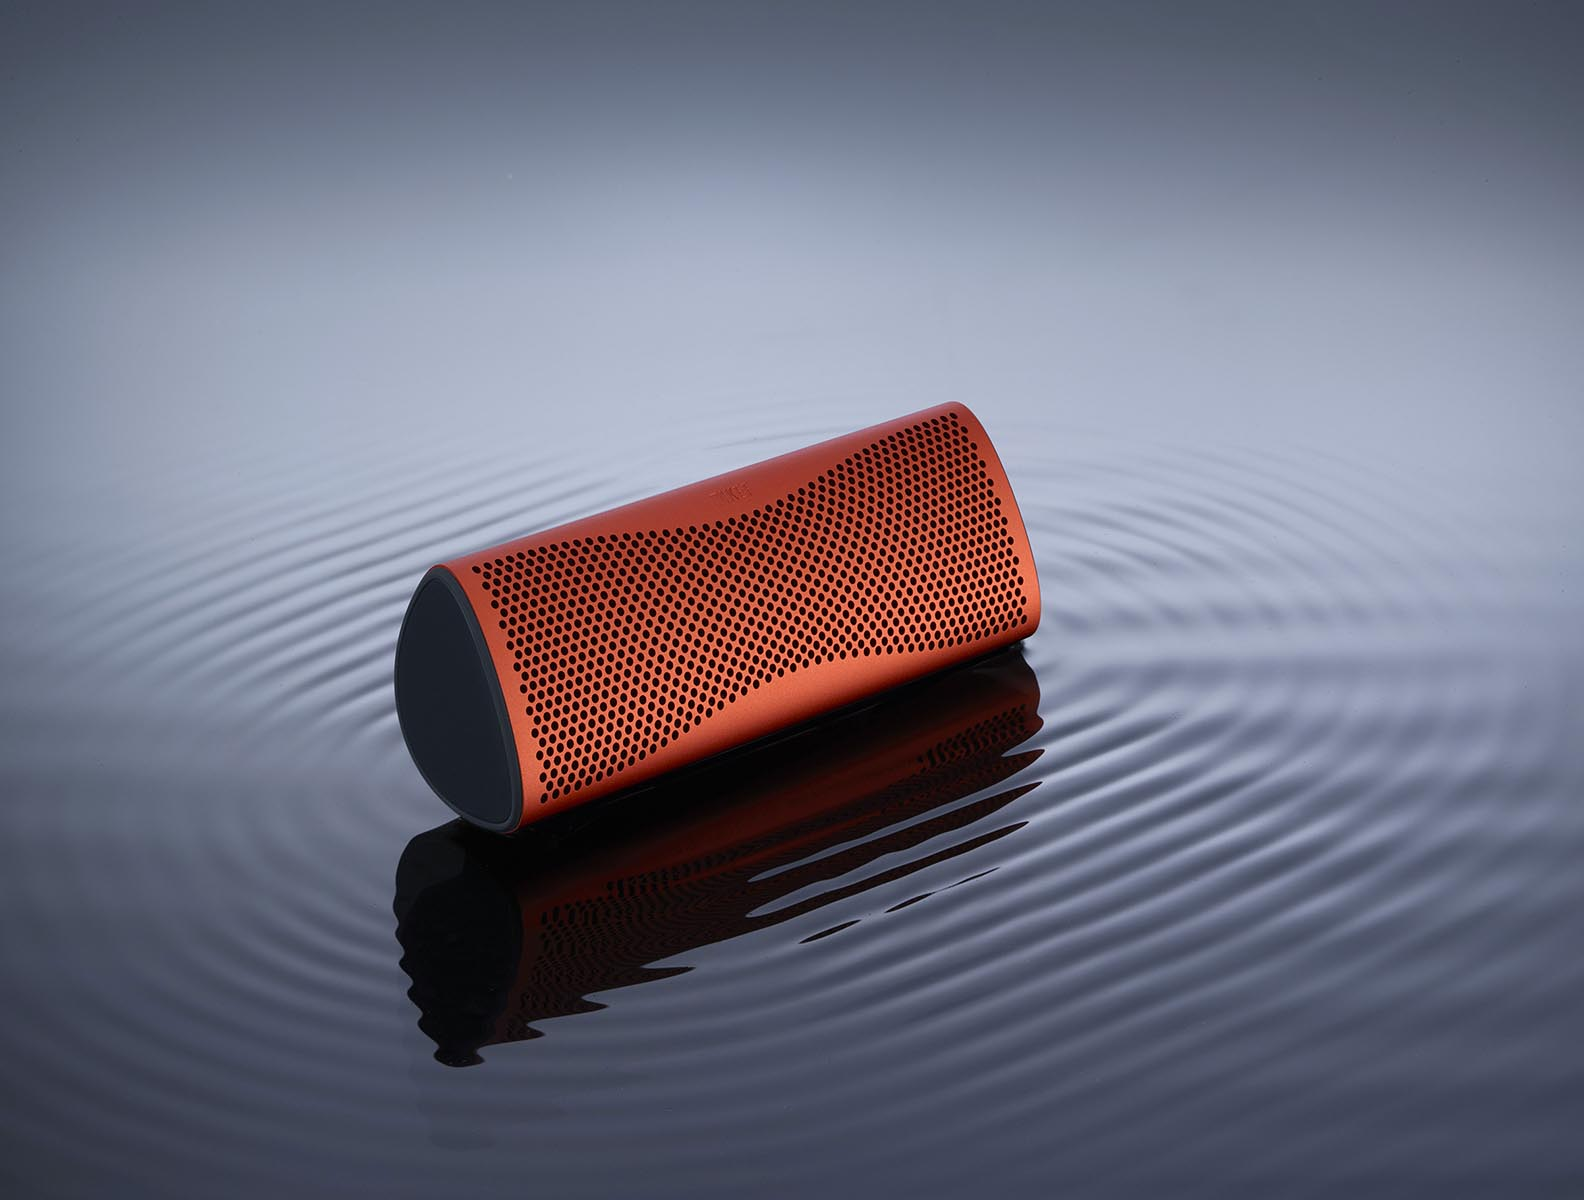 kef-muo-speaker-ross-lovegrove-computational-design-andrea-locatelli-09.jpg